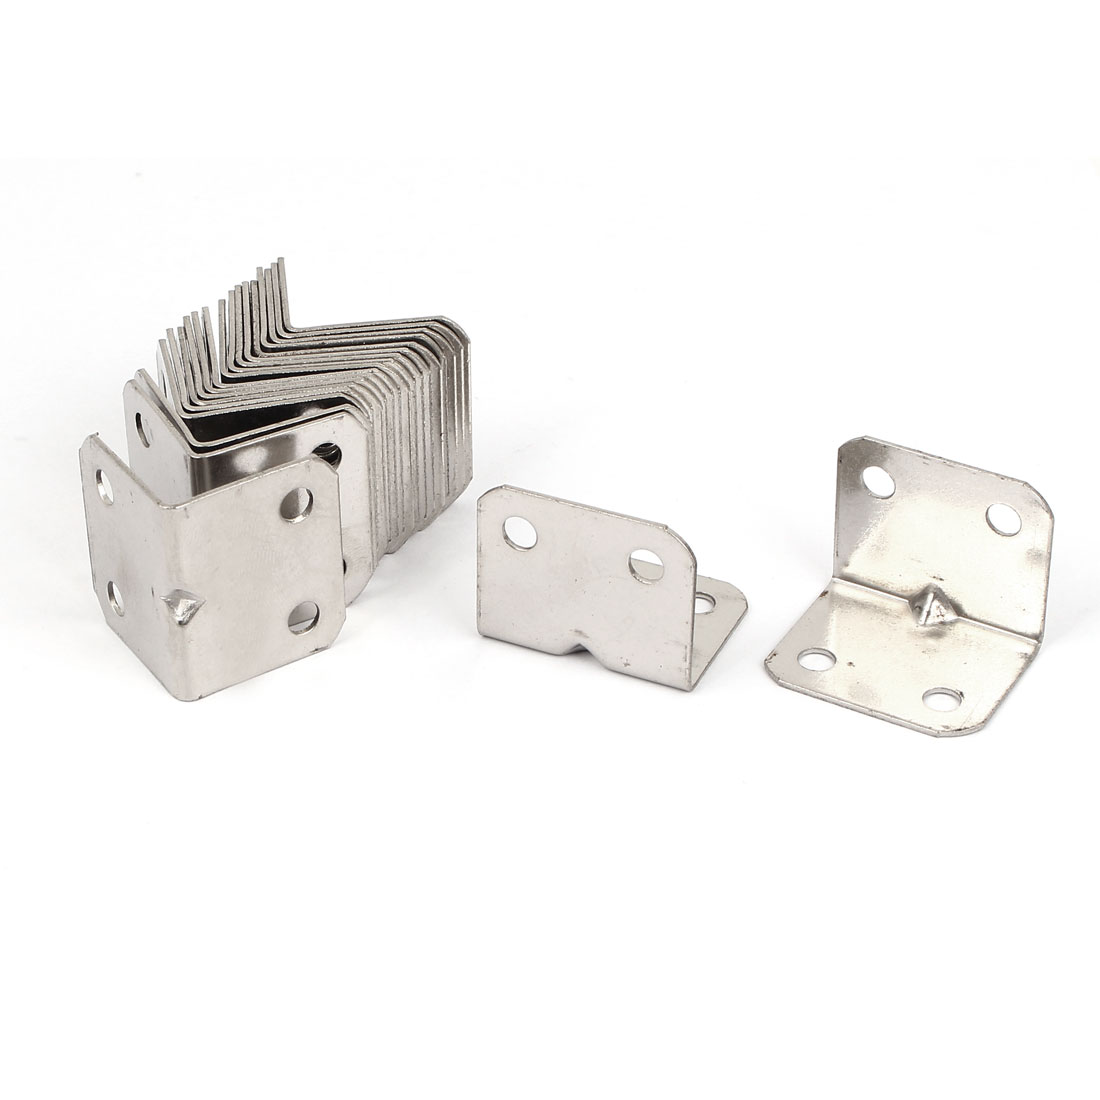 20pcs 25x25x31mm Stainless Steel Corner Brace Right Angle Bracket 1mm Thickness